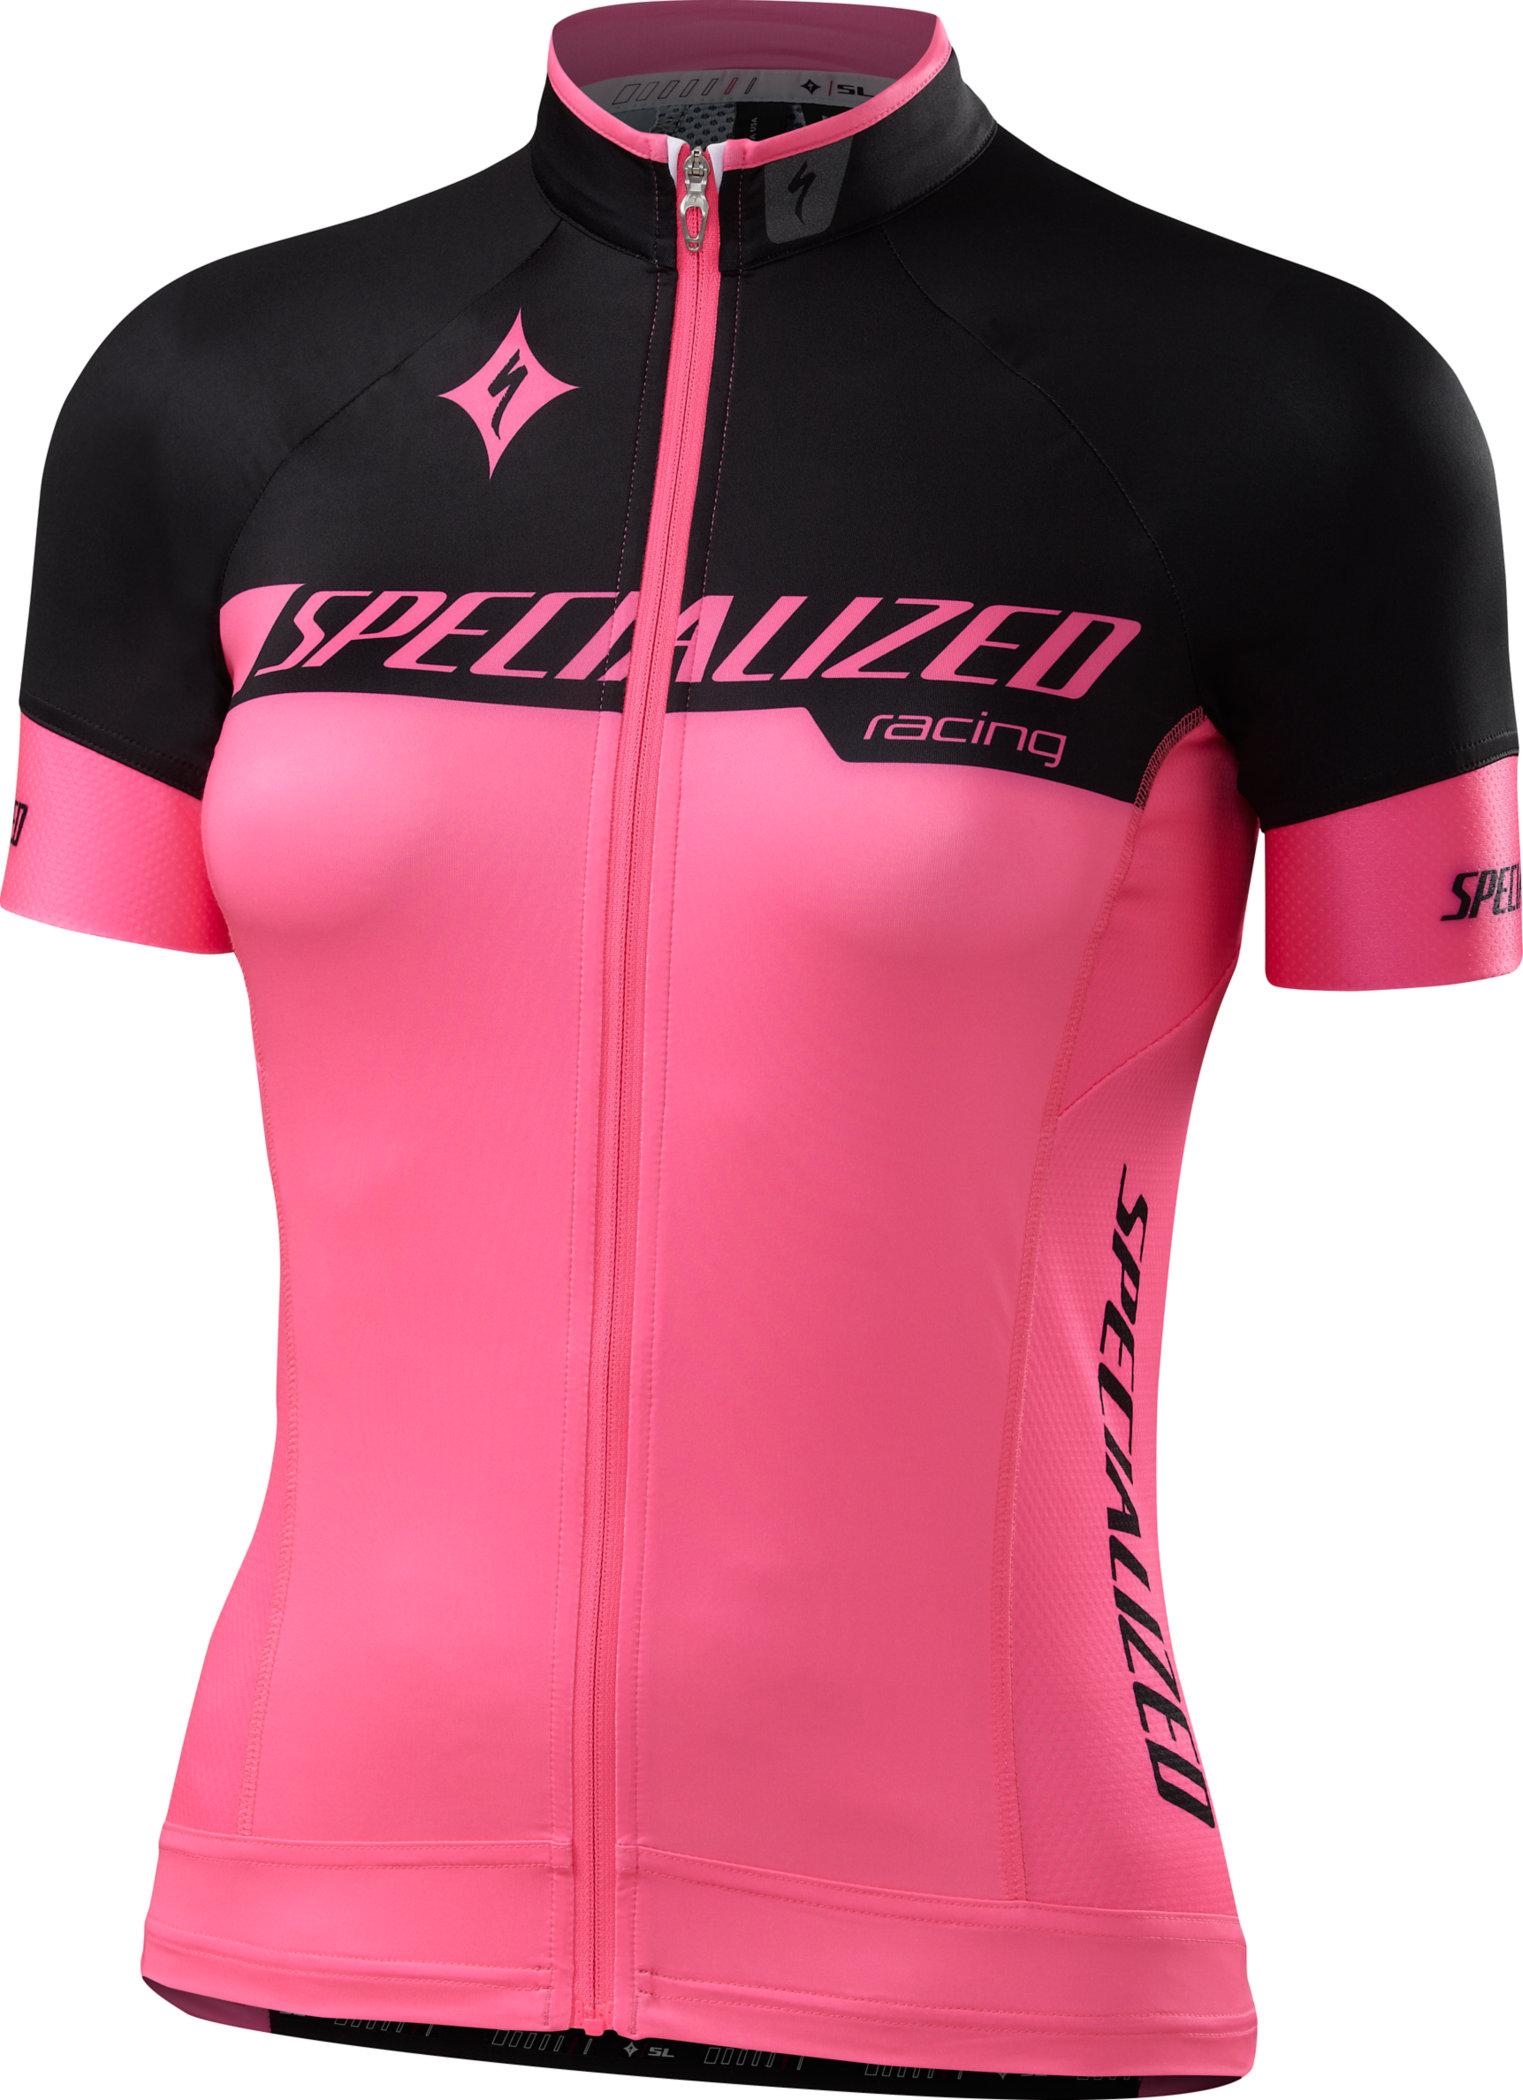 Specialized WOMEN´S SL PRO JERSEY  Team Neon Pink/Black Large - Alpha Bikes